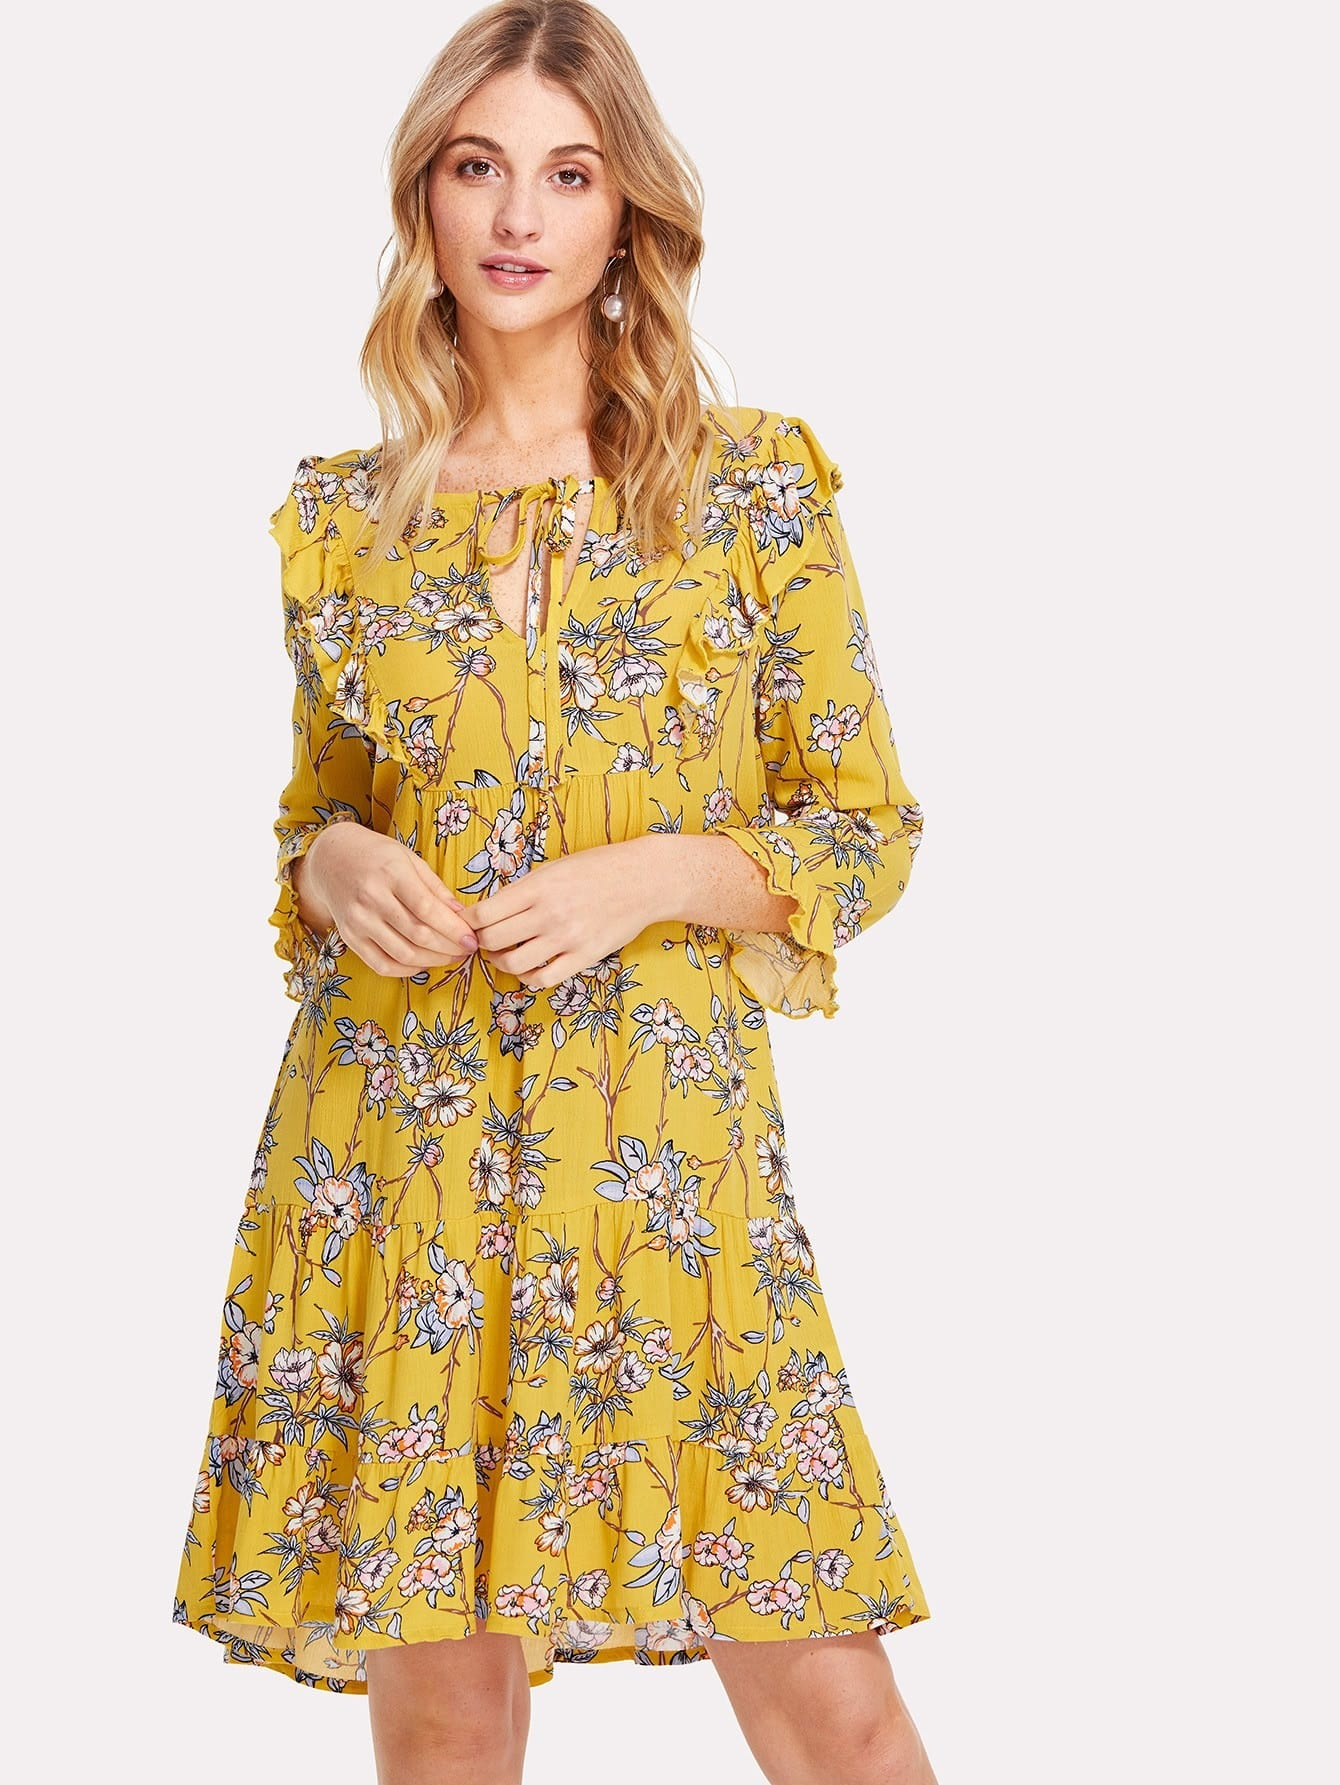 Keyhole Tie Neck Ruffle Floral Dress скребок калибр 21103